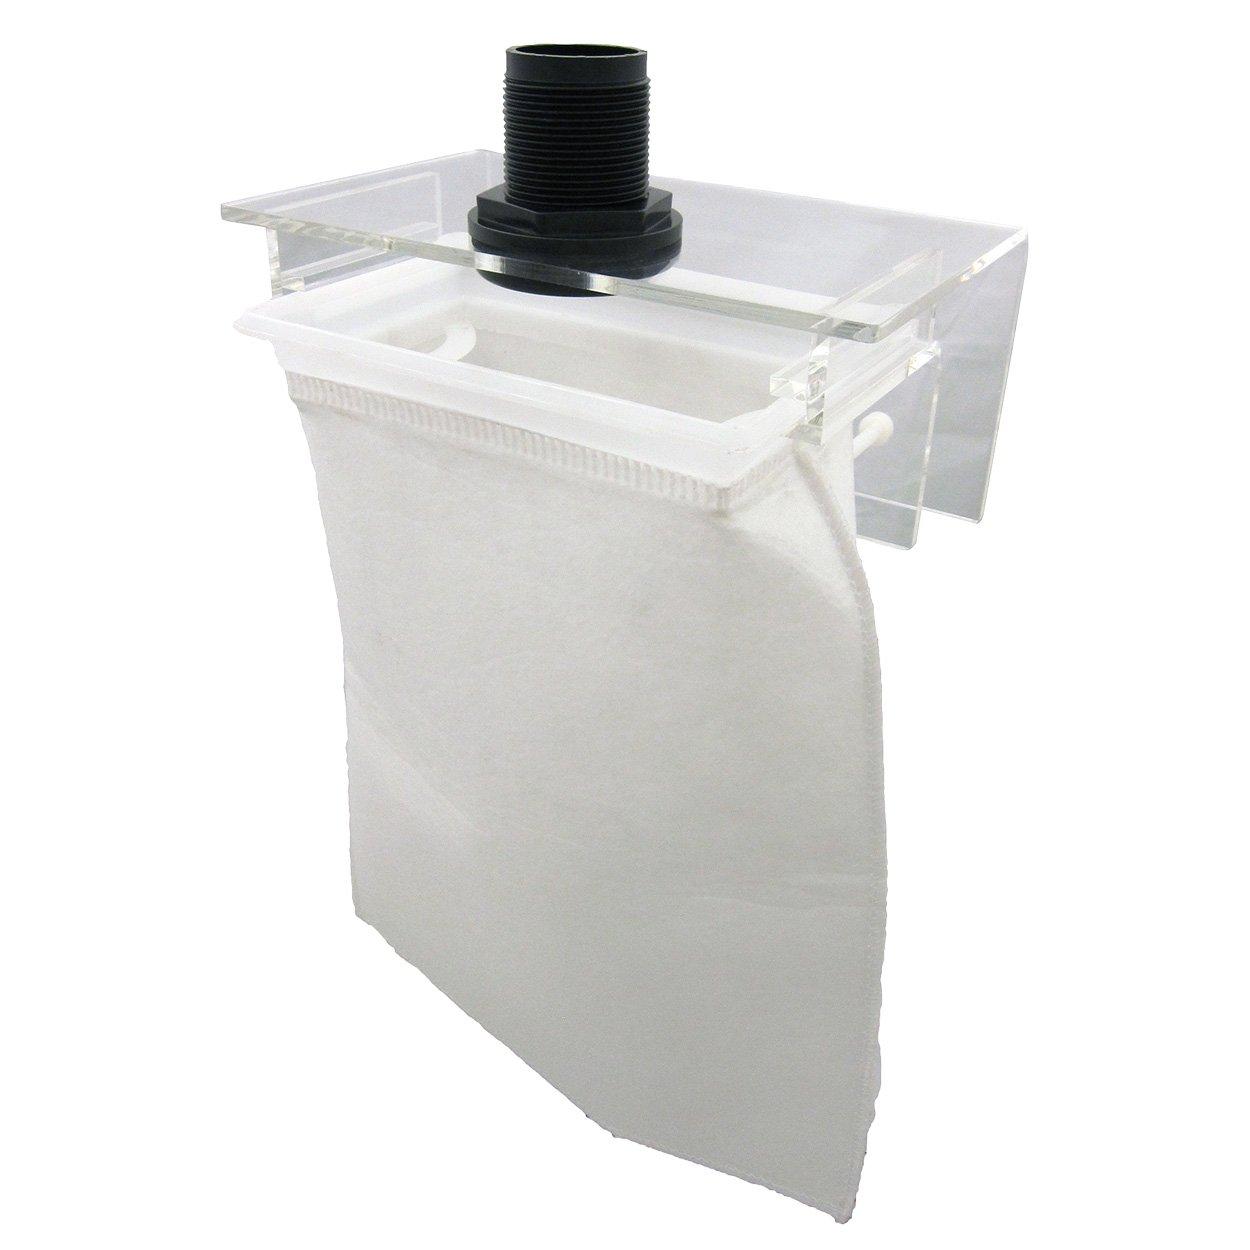 Seapora 56100 Micron Bag Holder, Large